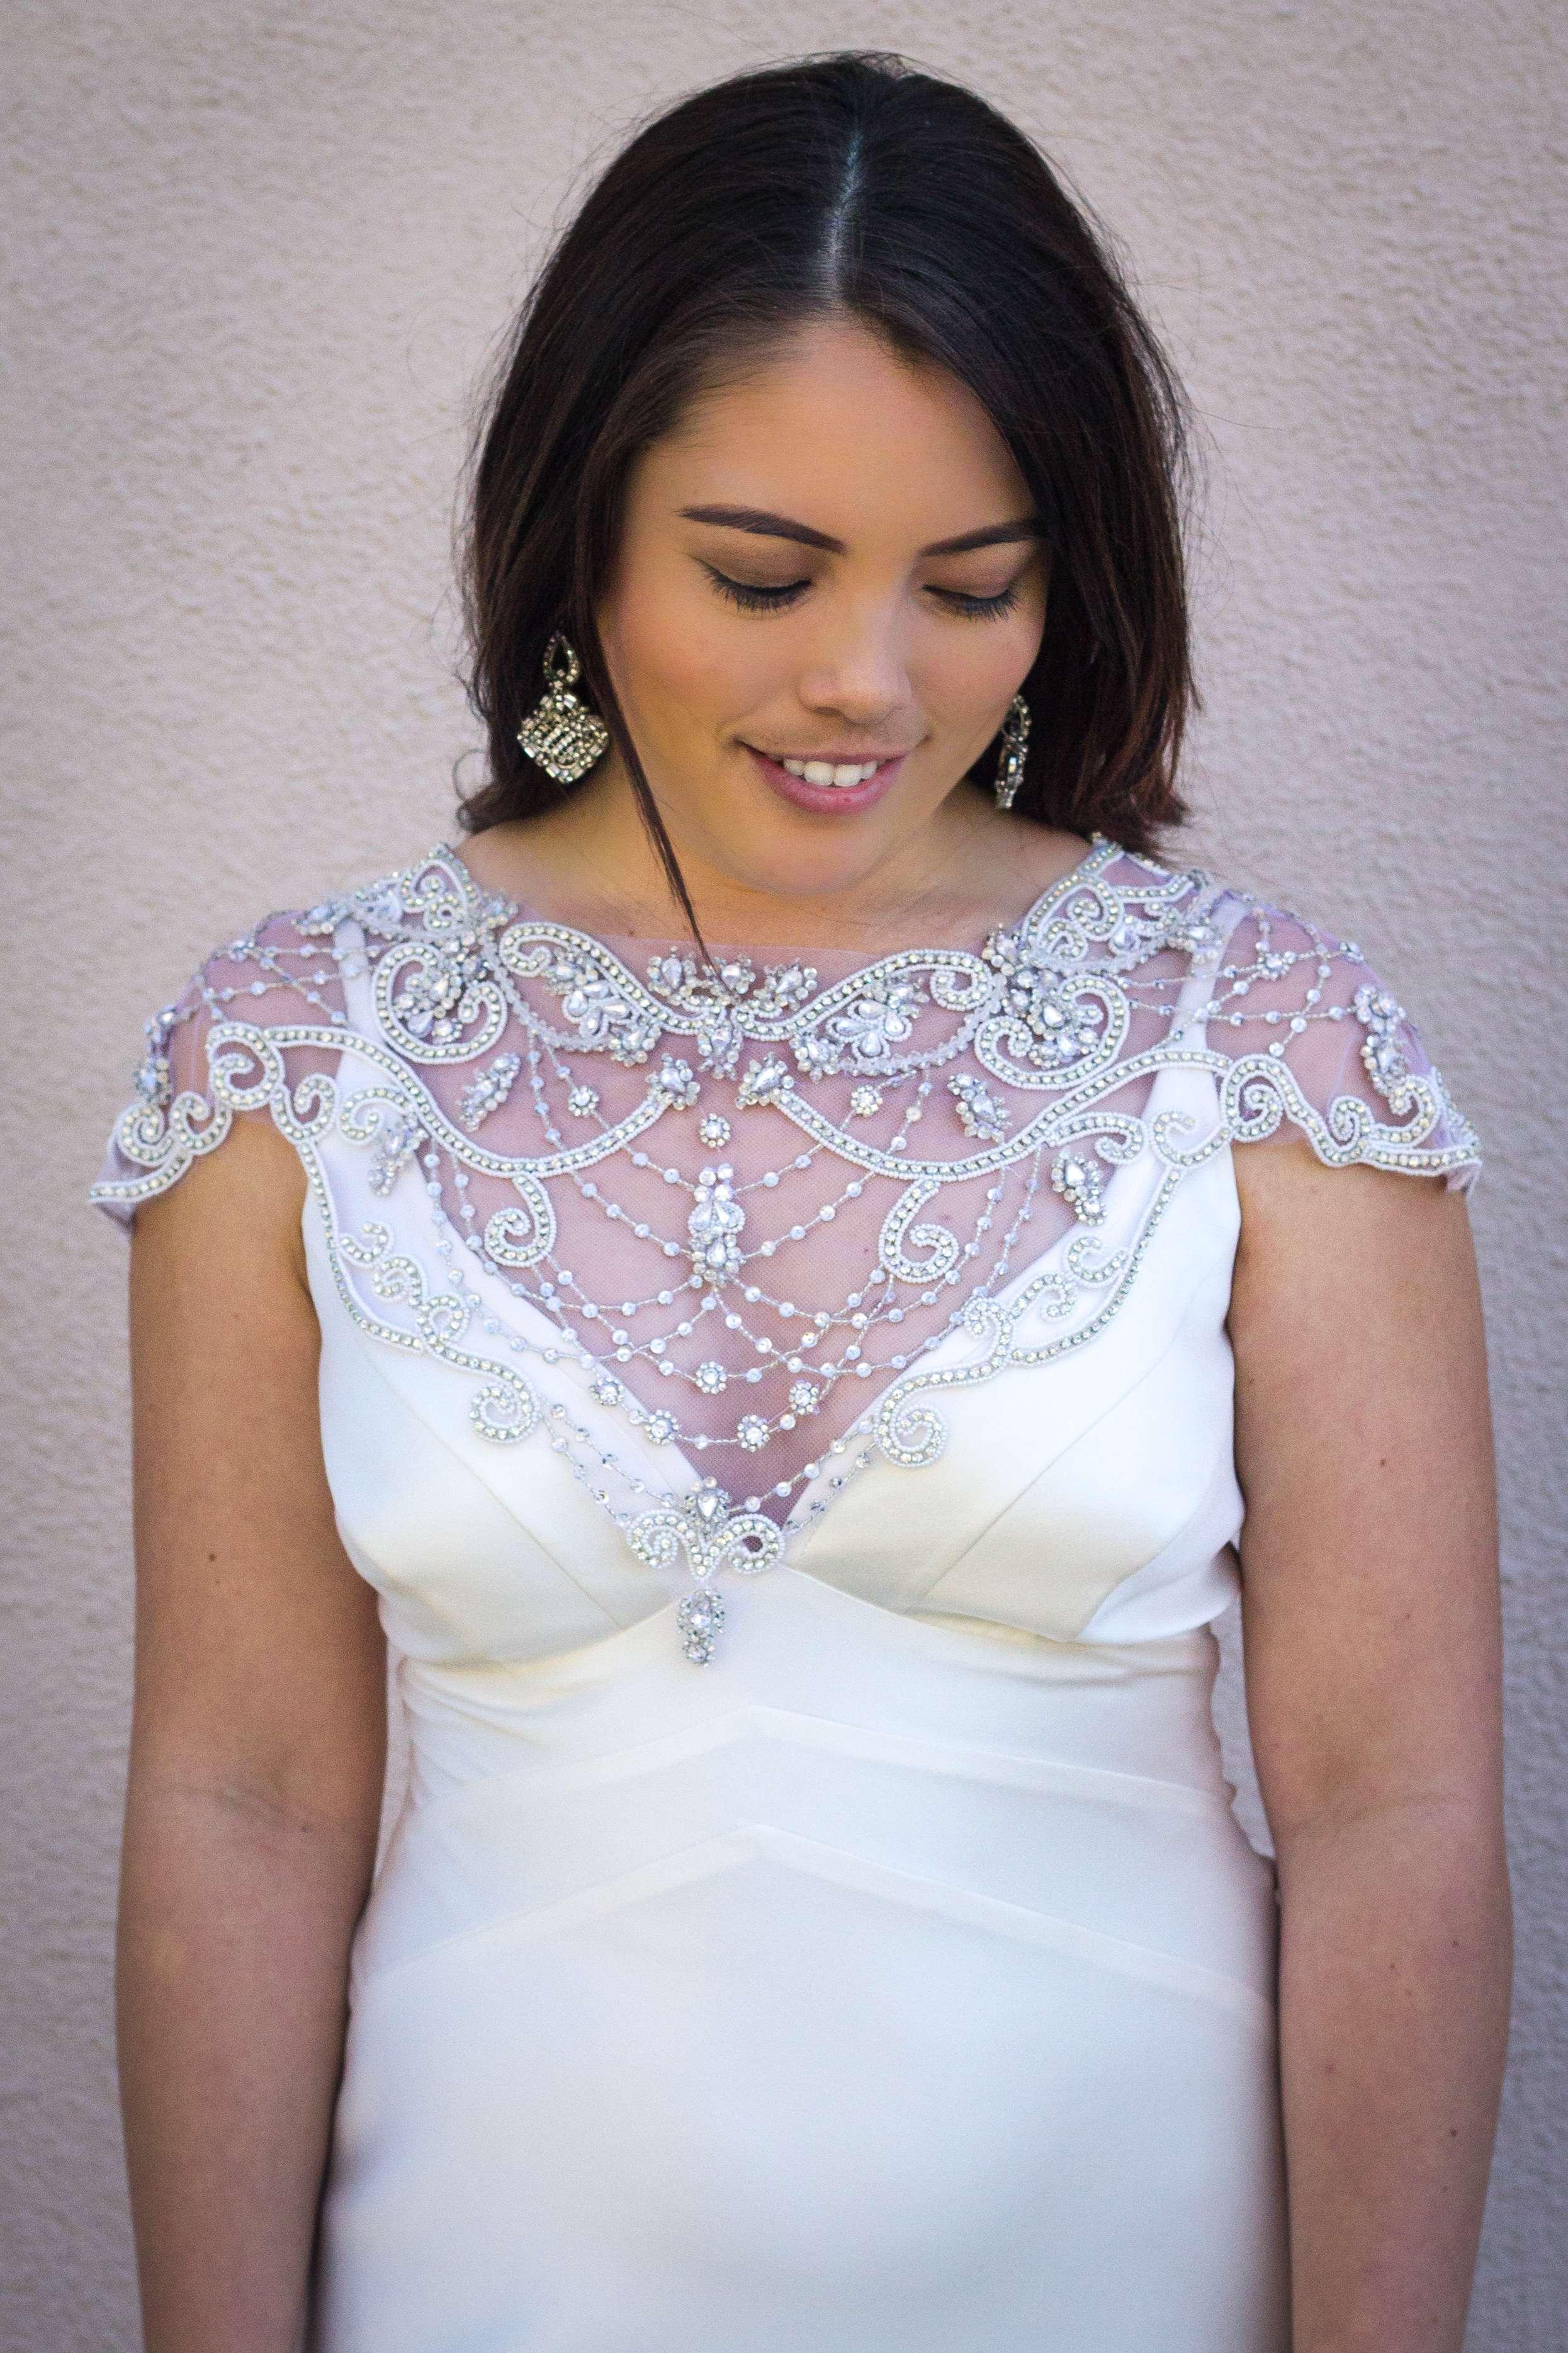 Dress: Suzanne Neville | Beaded cap sleeve: Theia | Earrings: Maria Elena